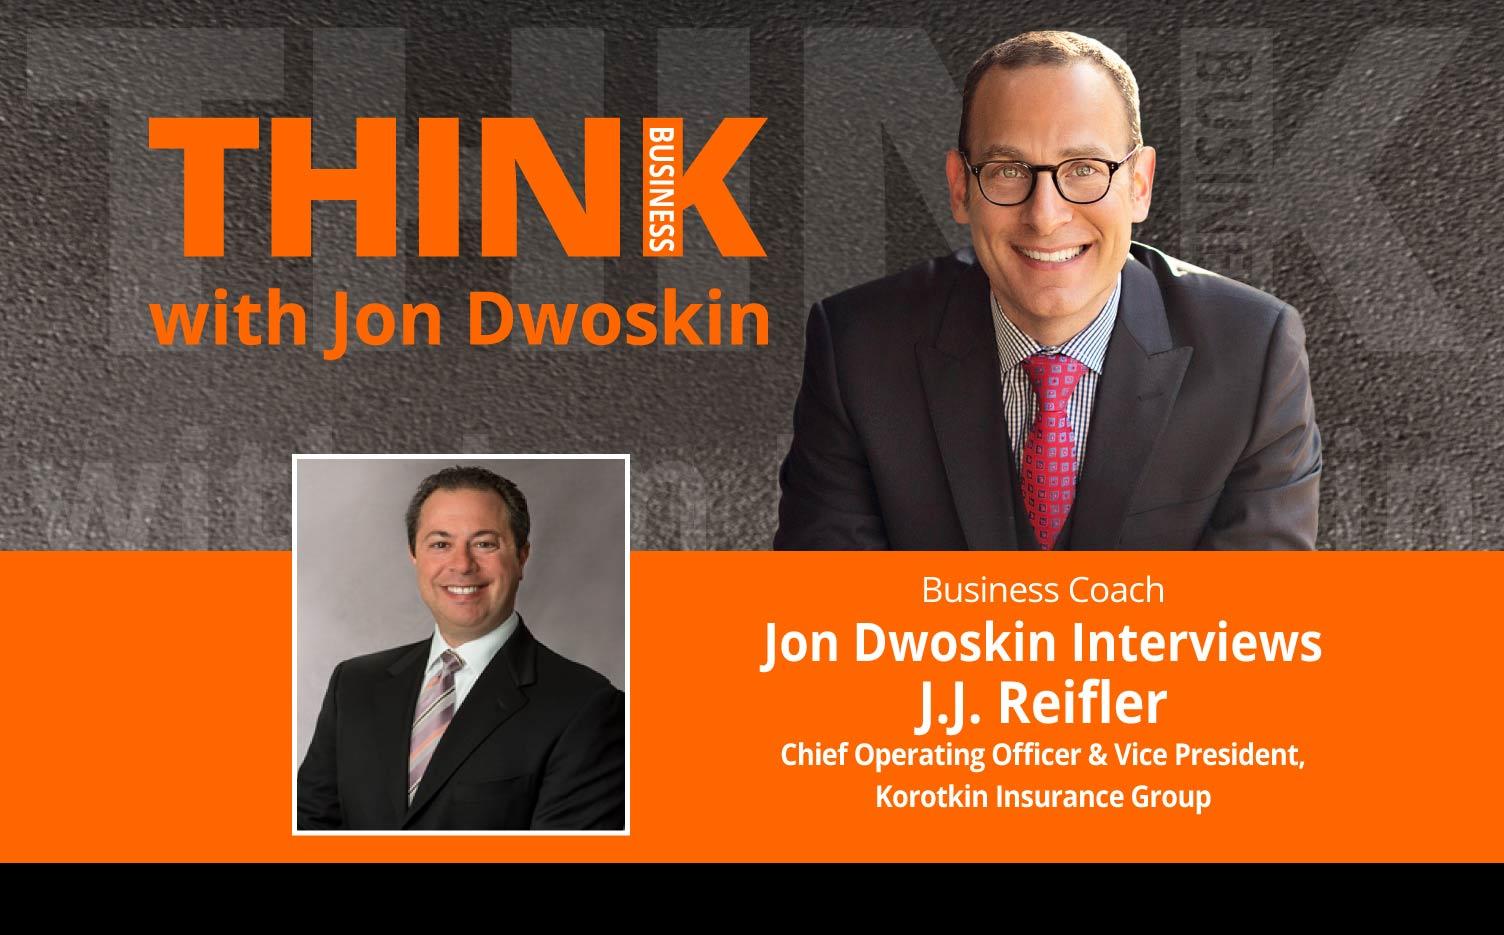 THINK Business Podcast: Jon Dwoskin Interviews J.J. Reifler, Chief Operating Officer & Vice President, Korotkin Insurance Group